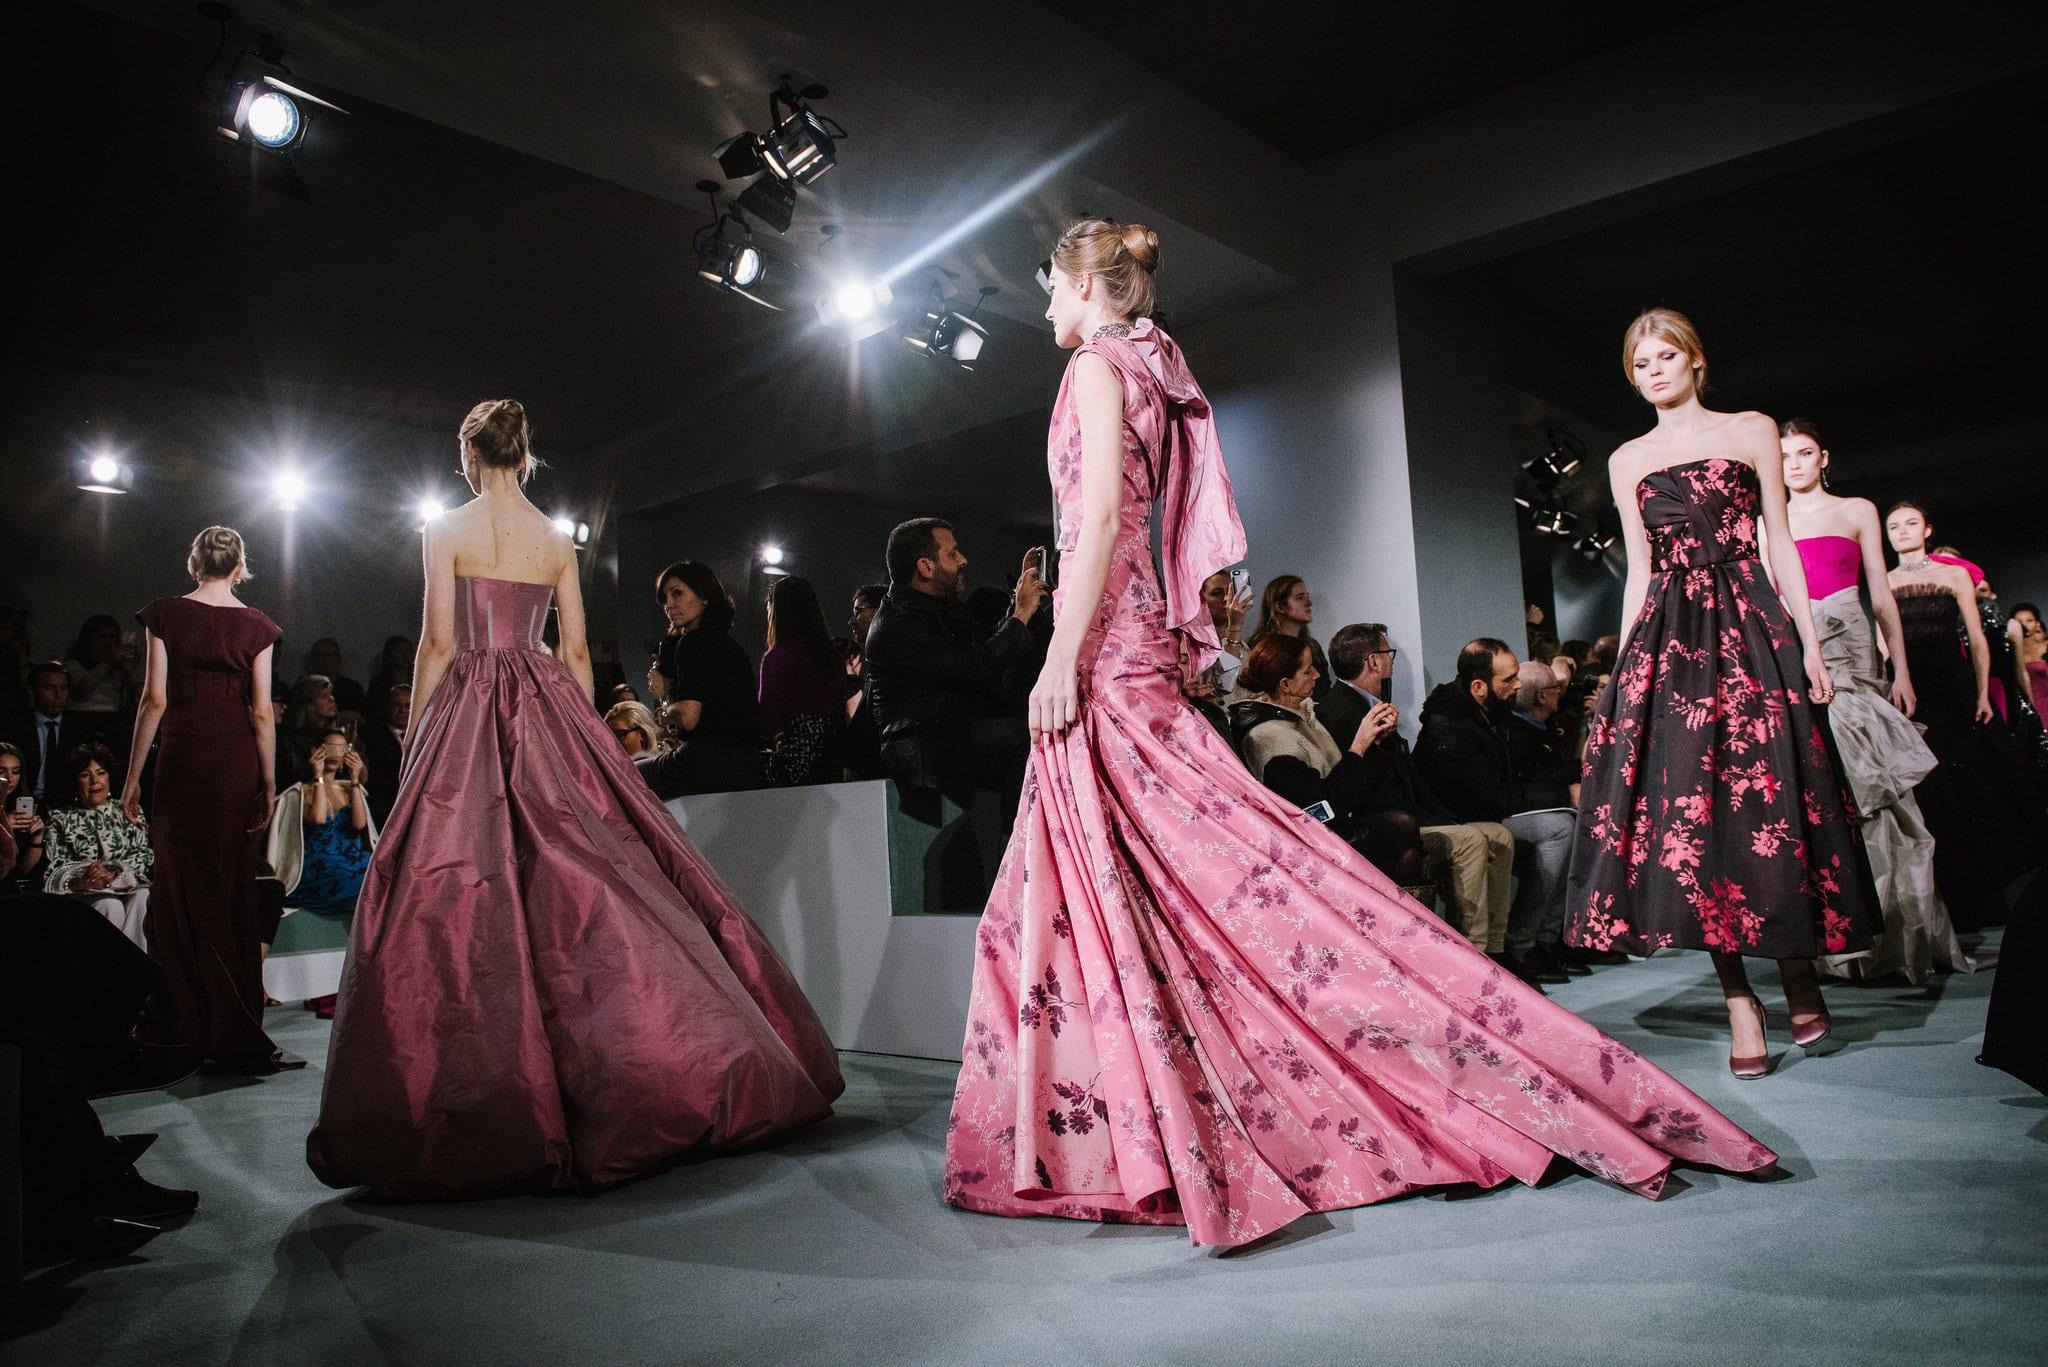 oscar-de-la-renta-formal-gowns-runway-pink-fuchsia-berry-floral-dress-cococozy-nyt